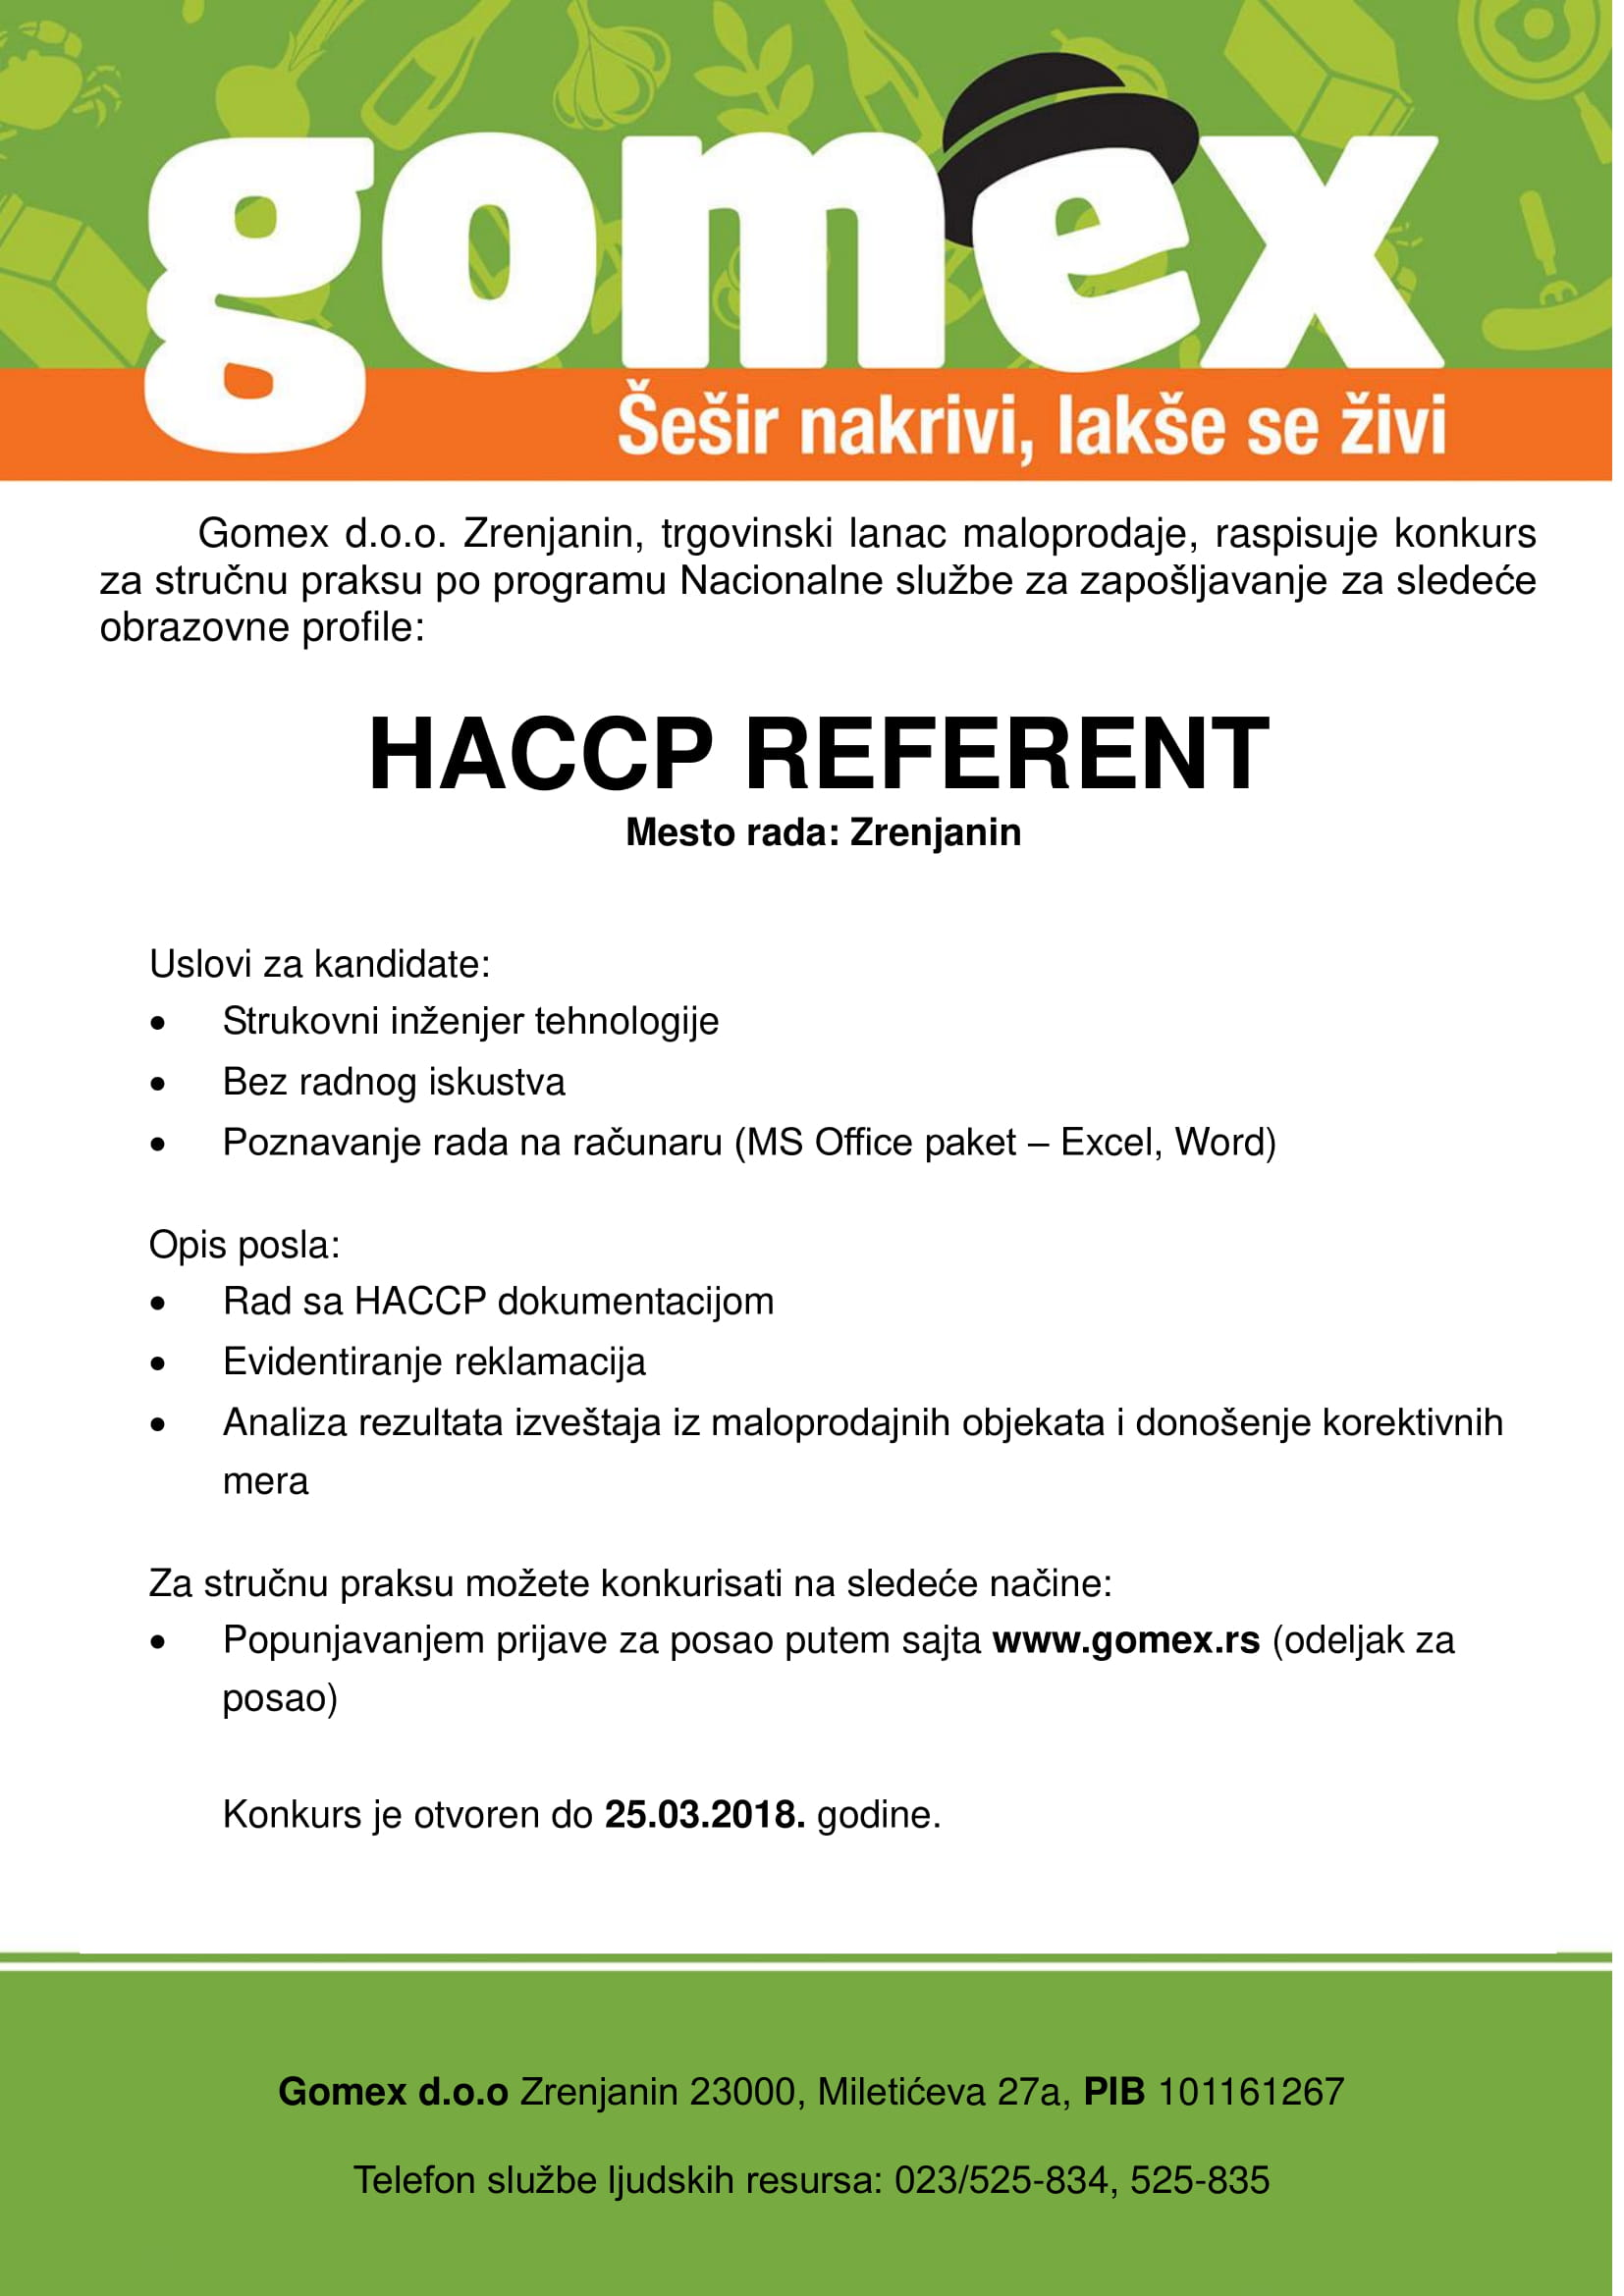 HACCP Referent